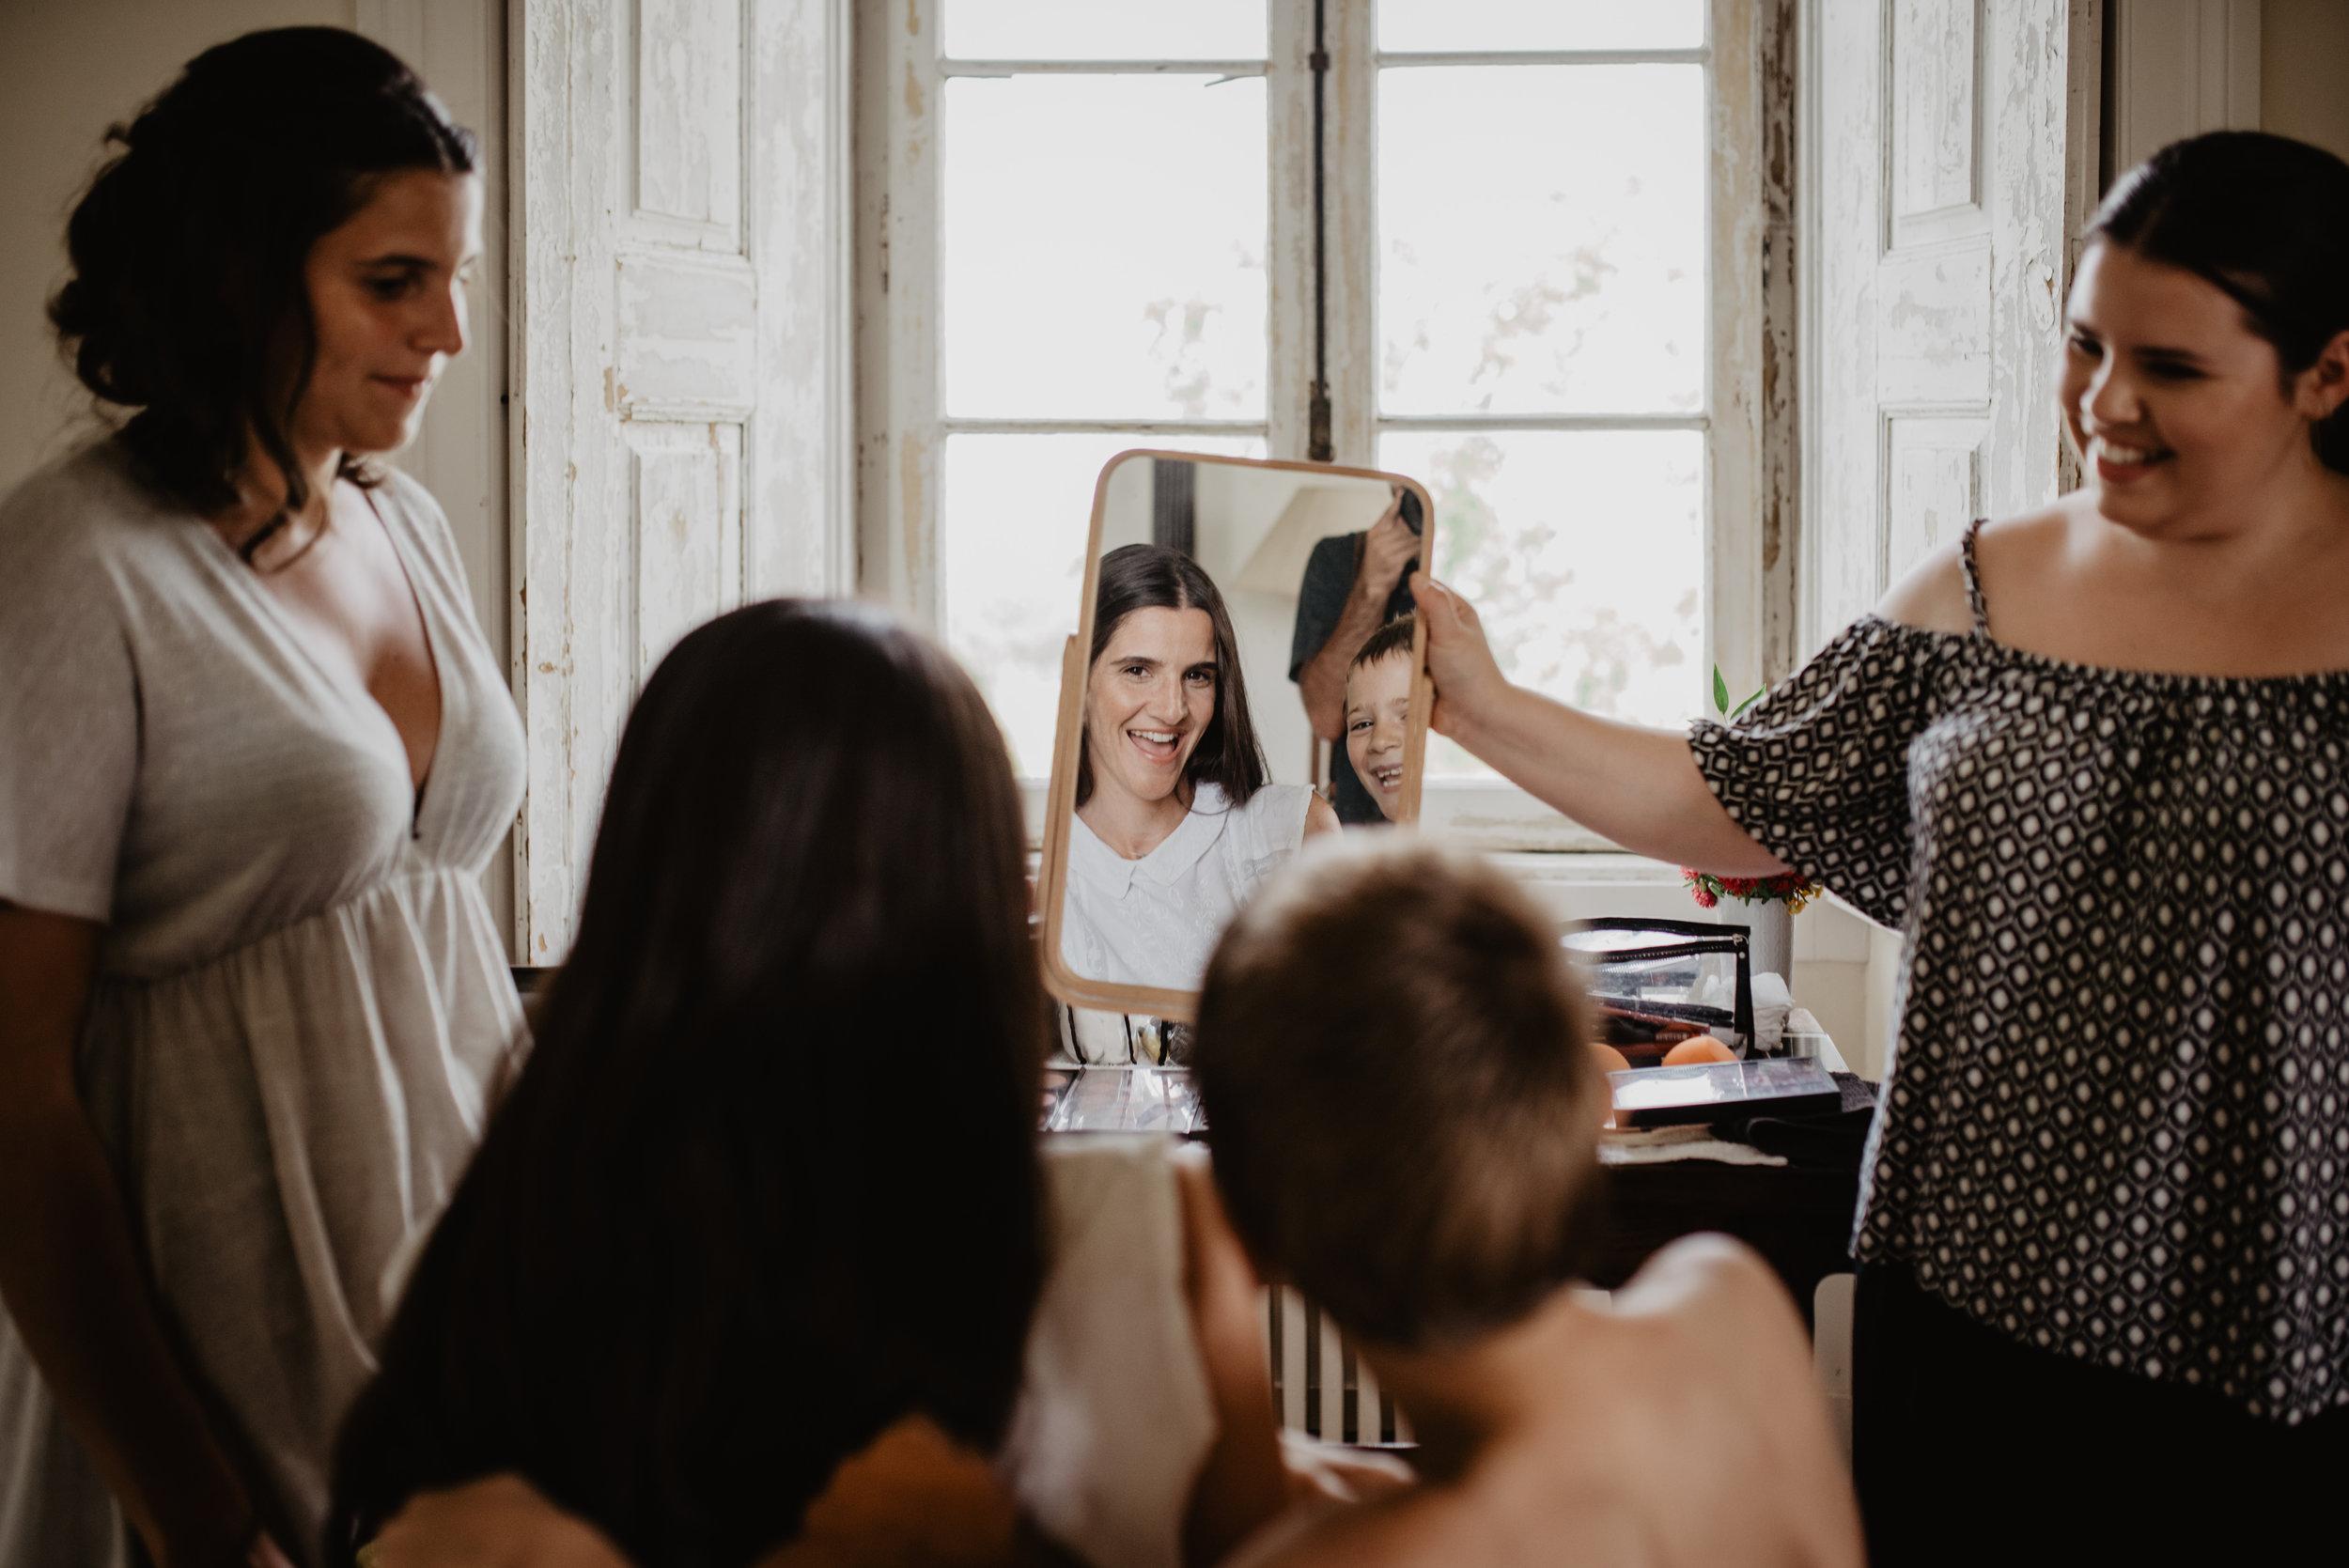 Lapela-photography-wedding-sintra-portugal-7.jpg